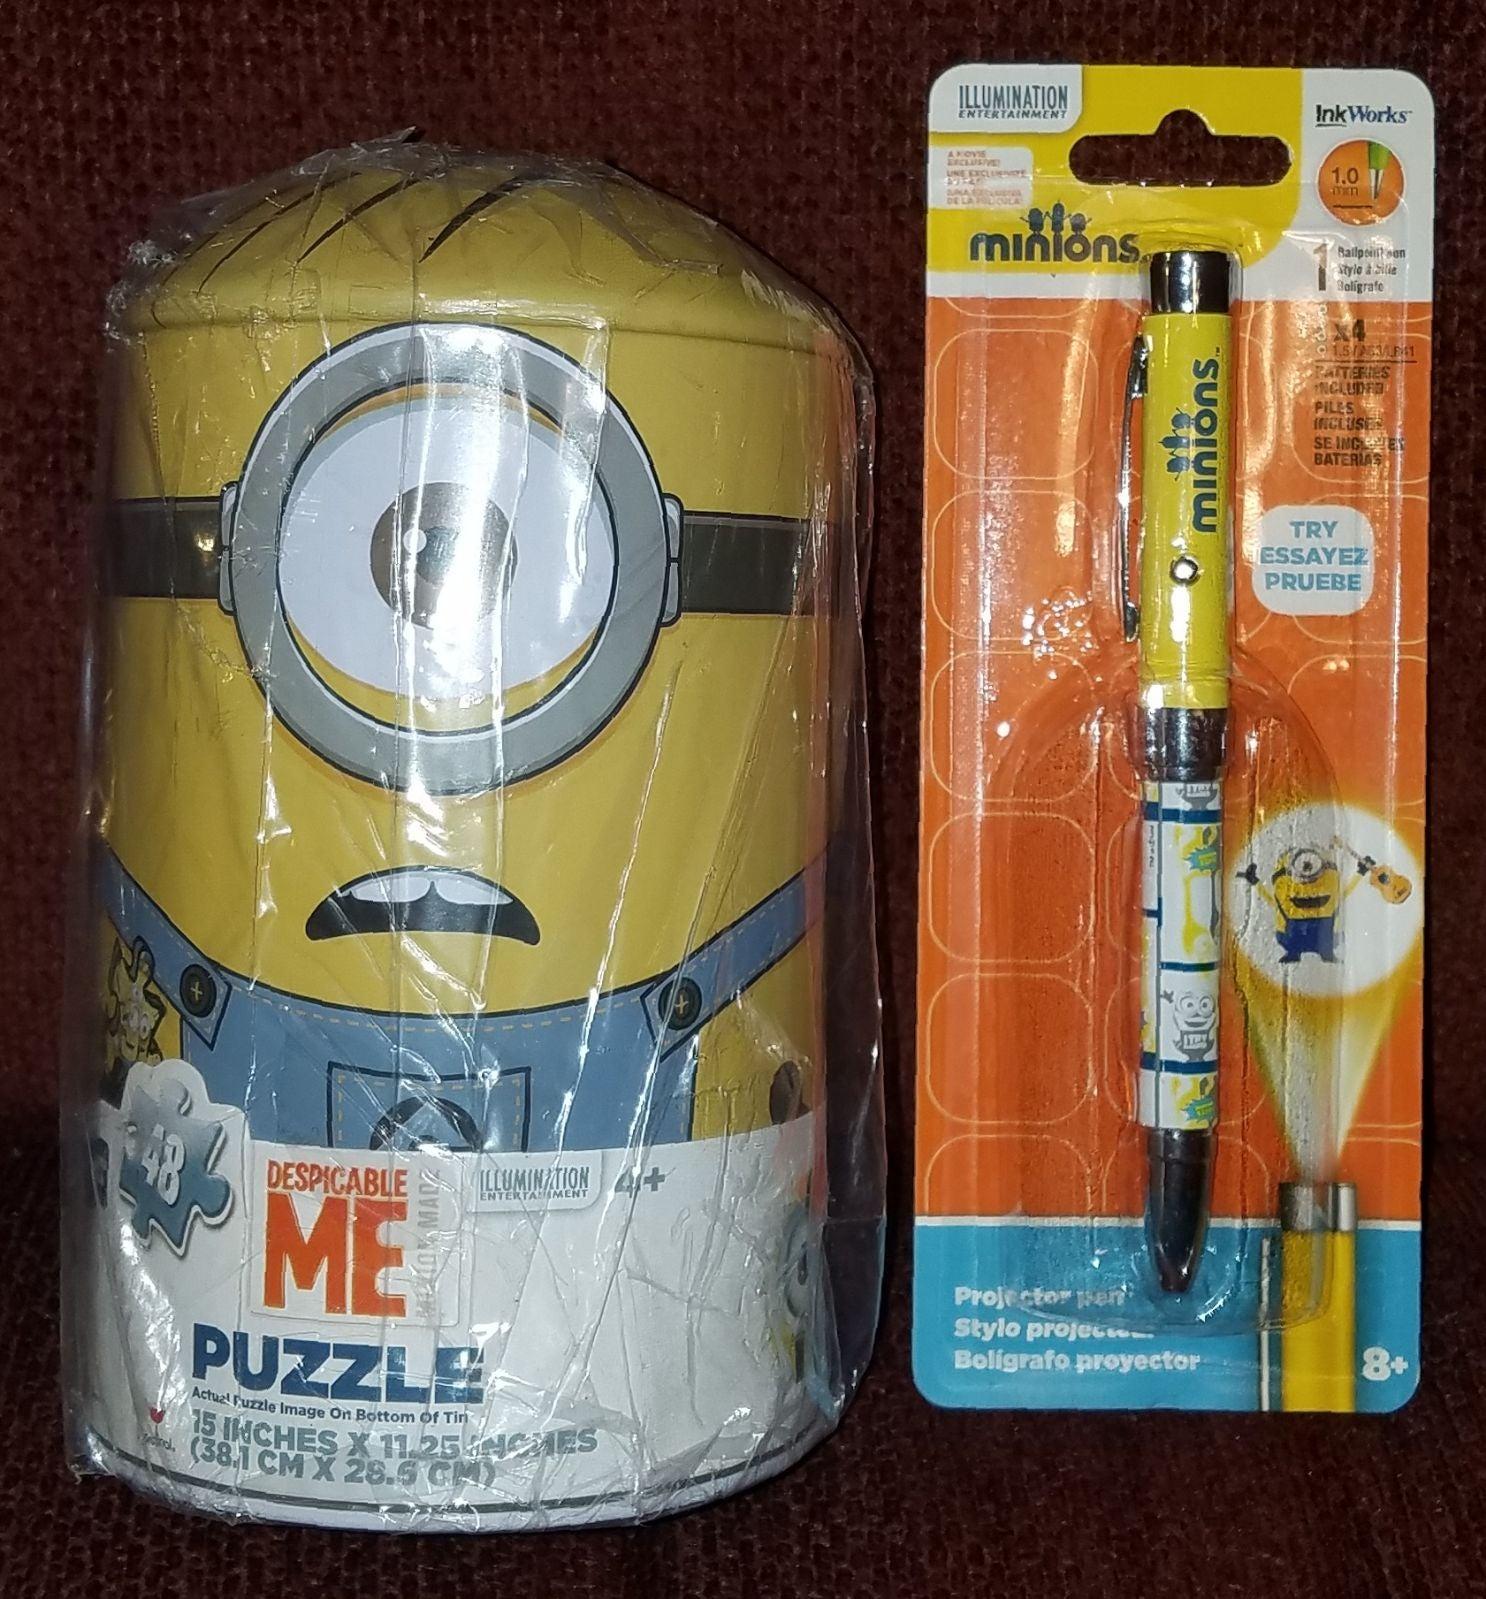 Despicable Me Puzzle Tin & Projector Pen